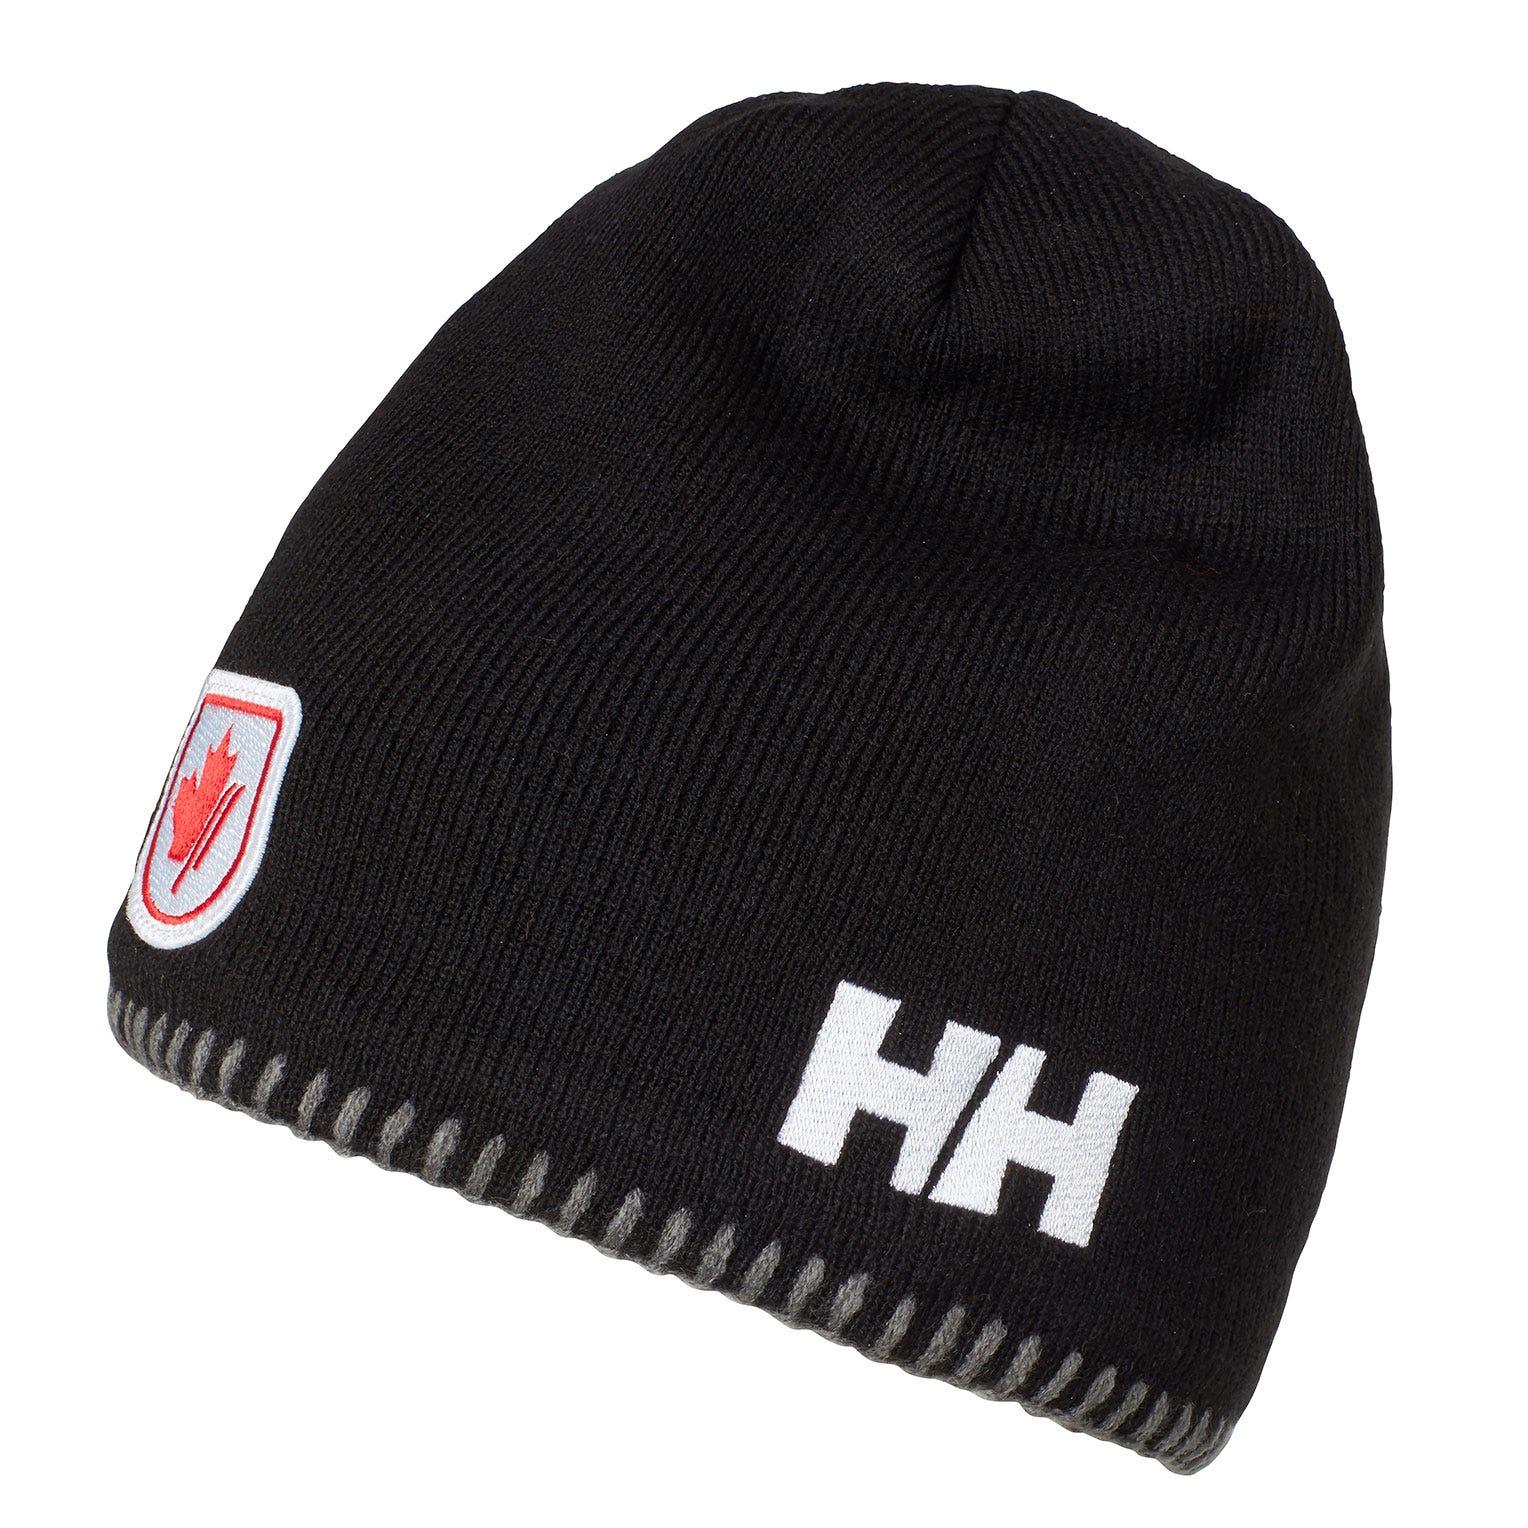 Helly Hansen Mountain Beanie Fleece Lined Black STD